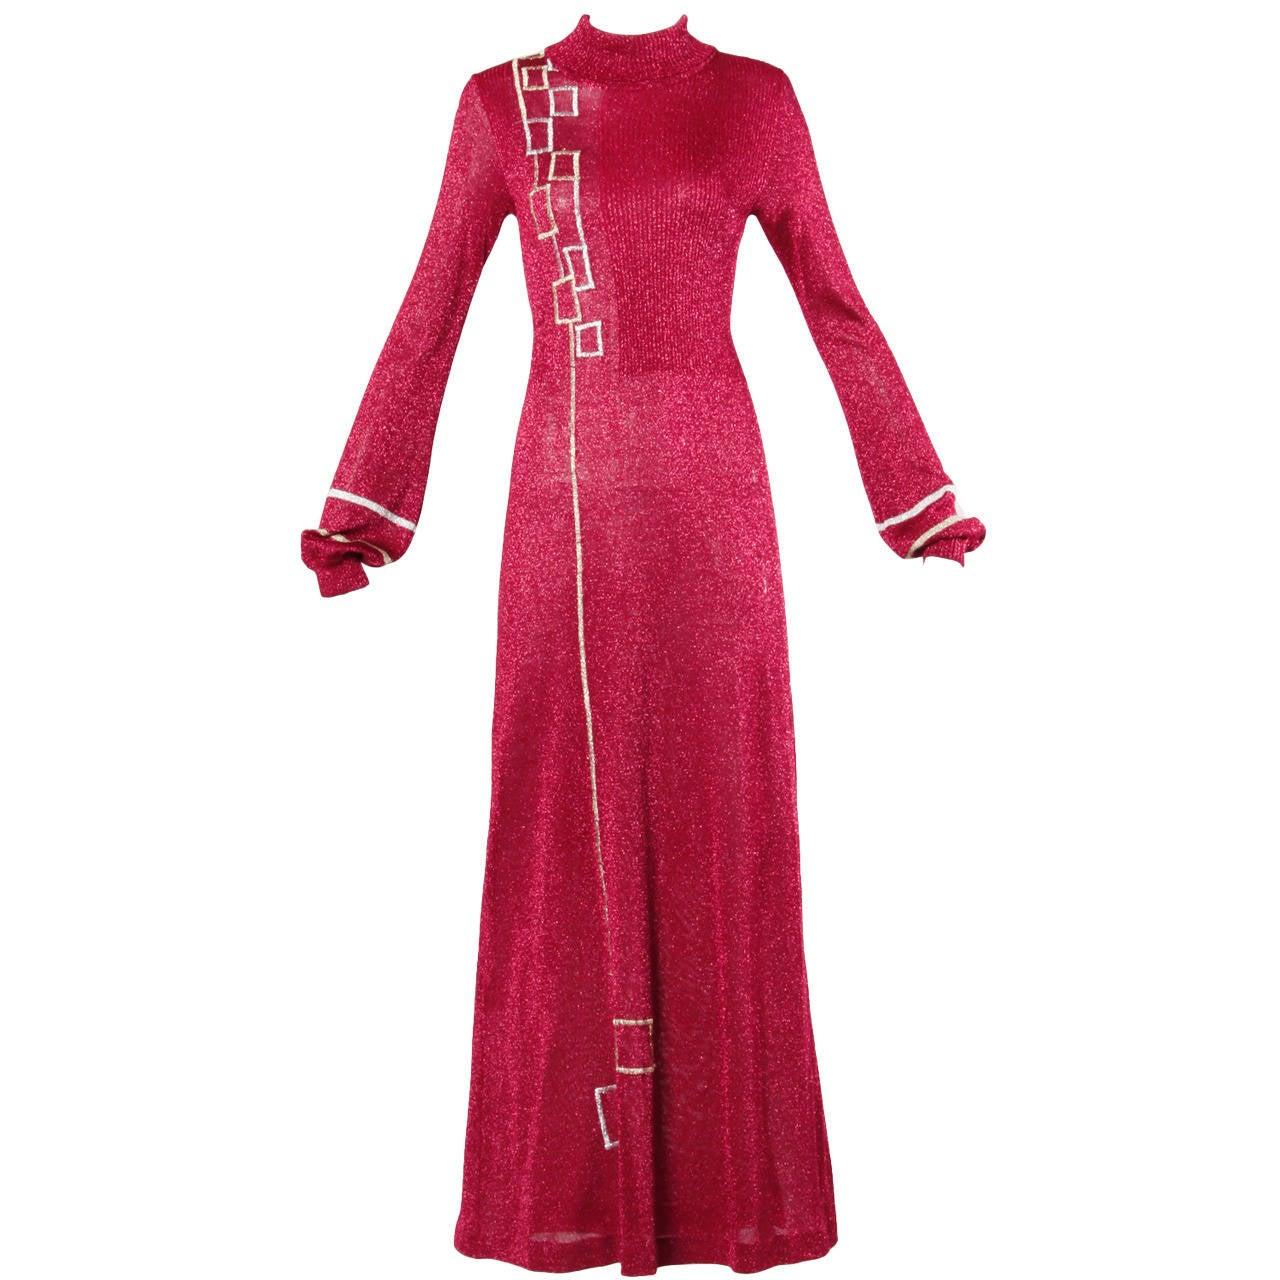 Wenjilli vintage s metallic knit maxi dress with art